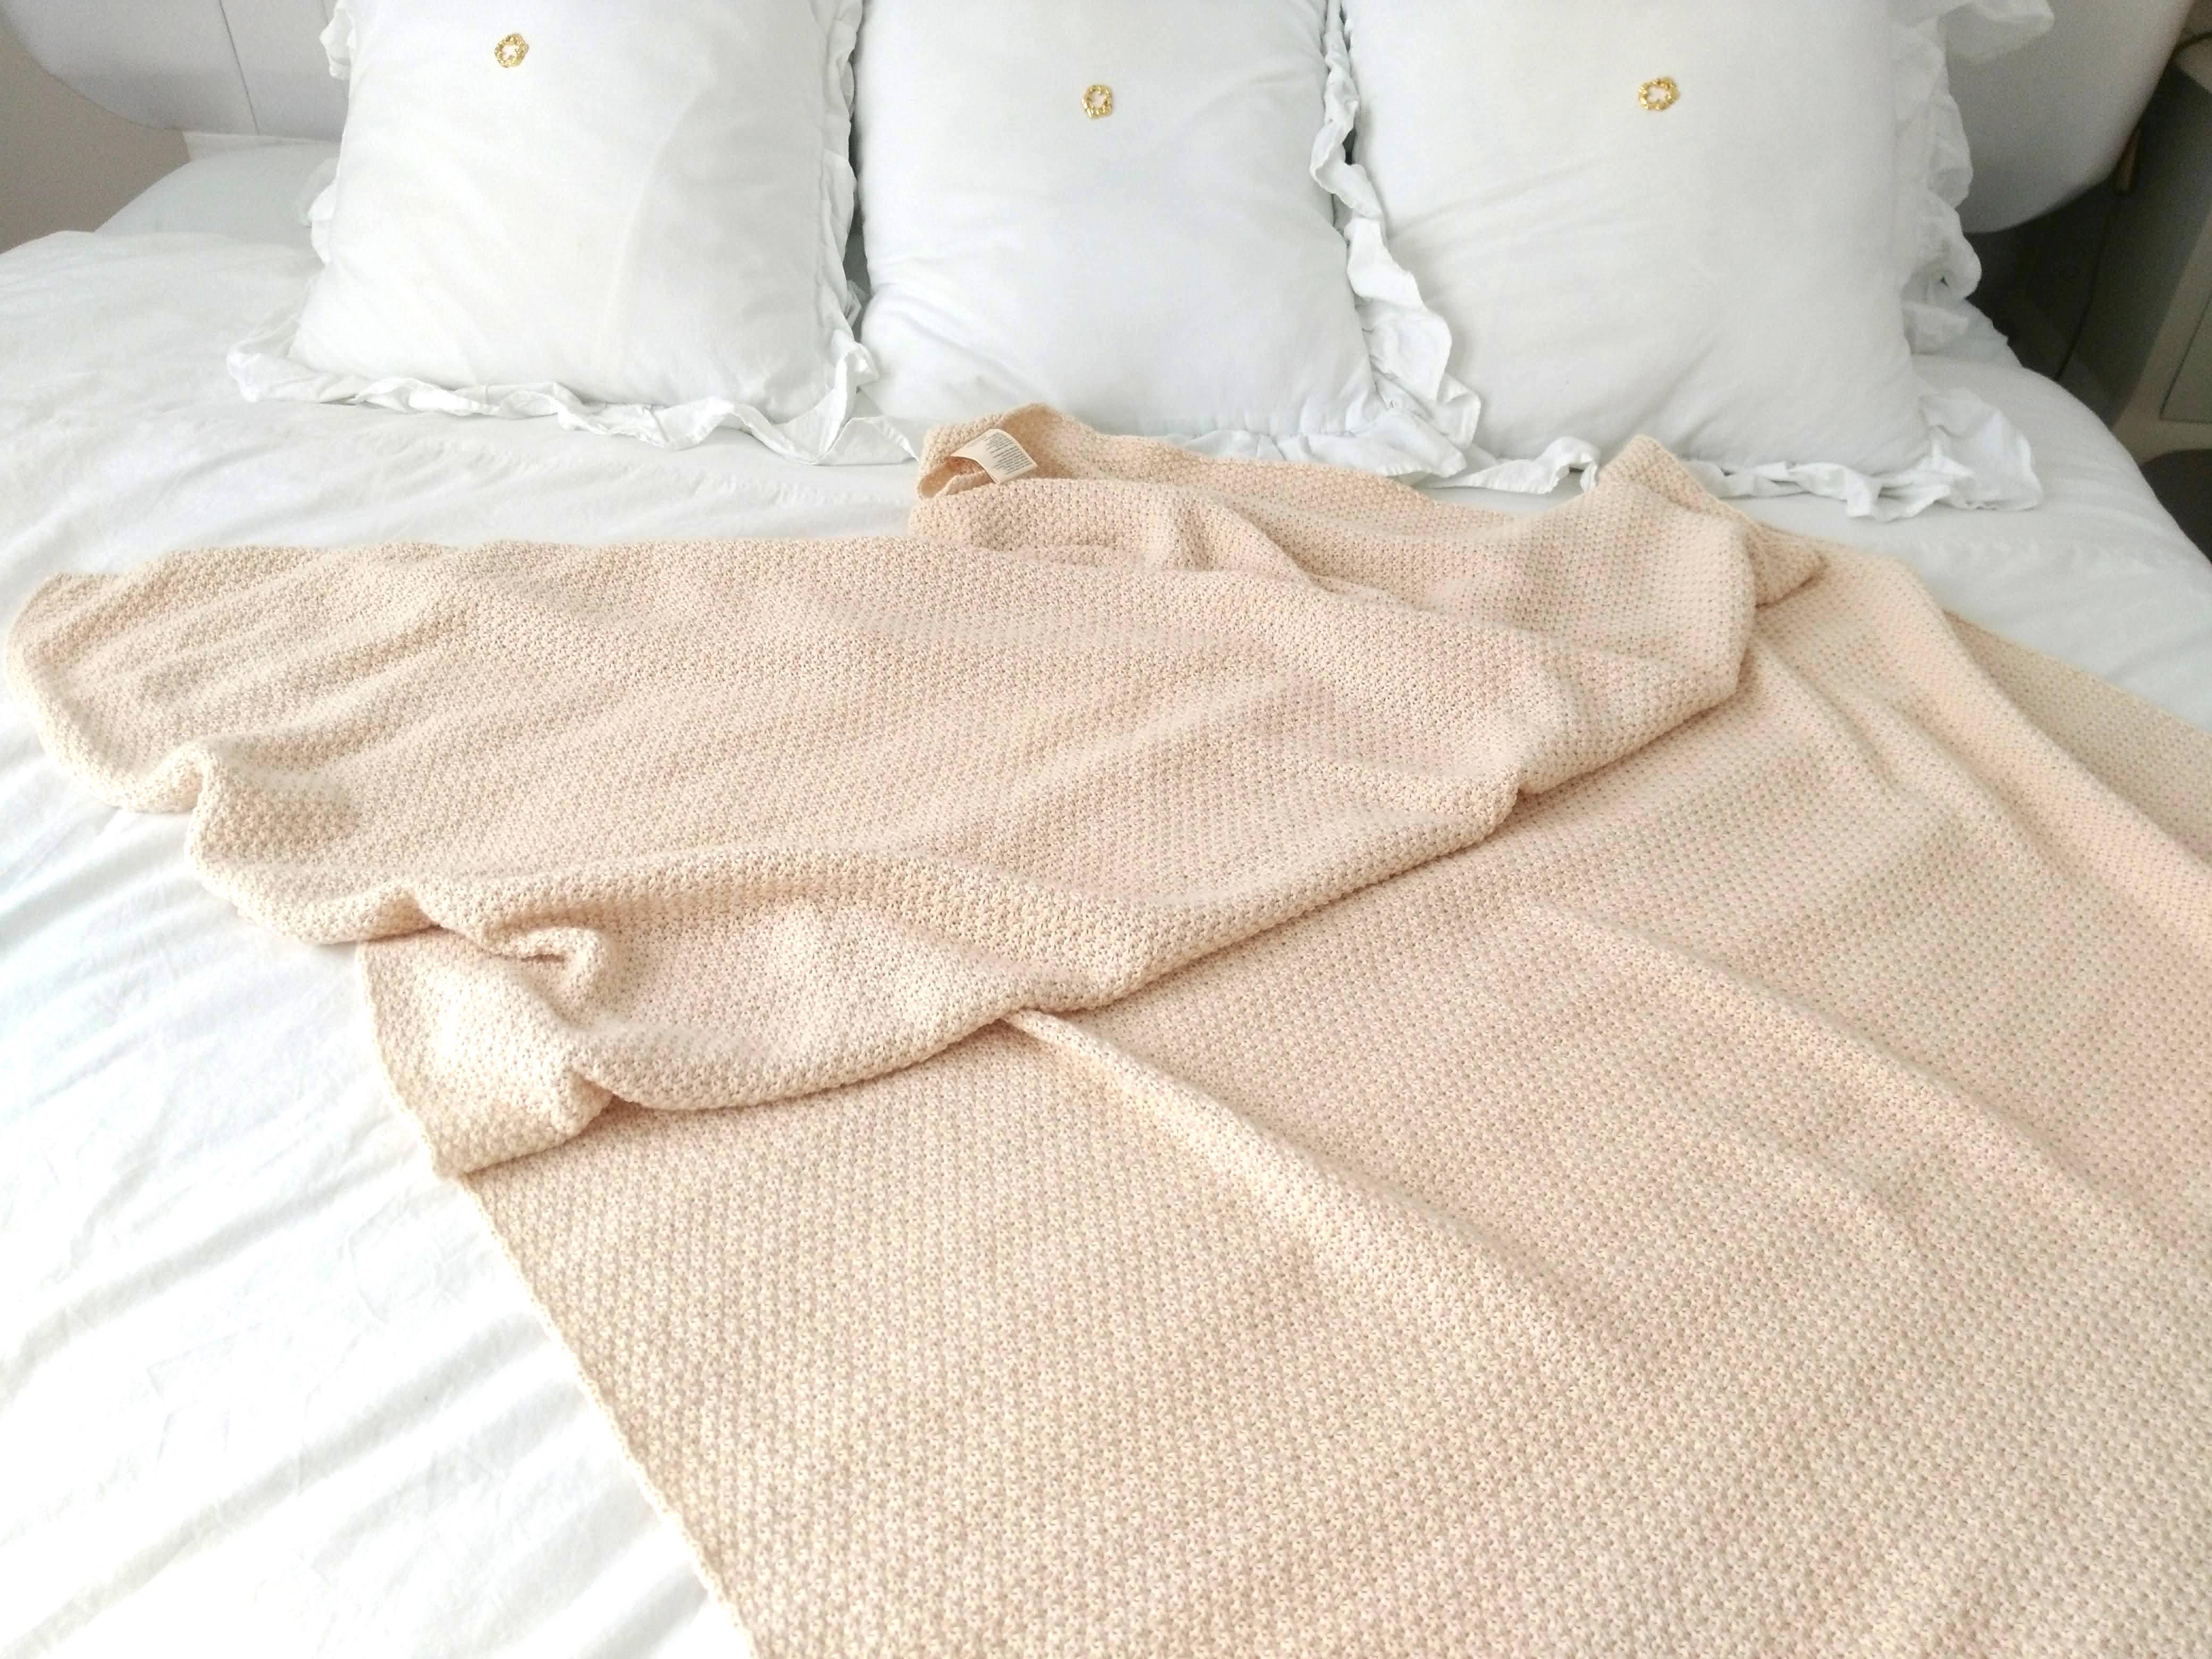 Organic cotton100% Knitting Blancket  オーガニックコットン100% 立体編みの大きめブランケット